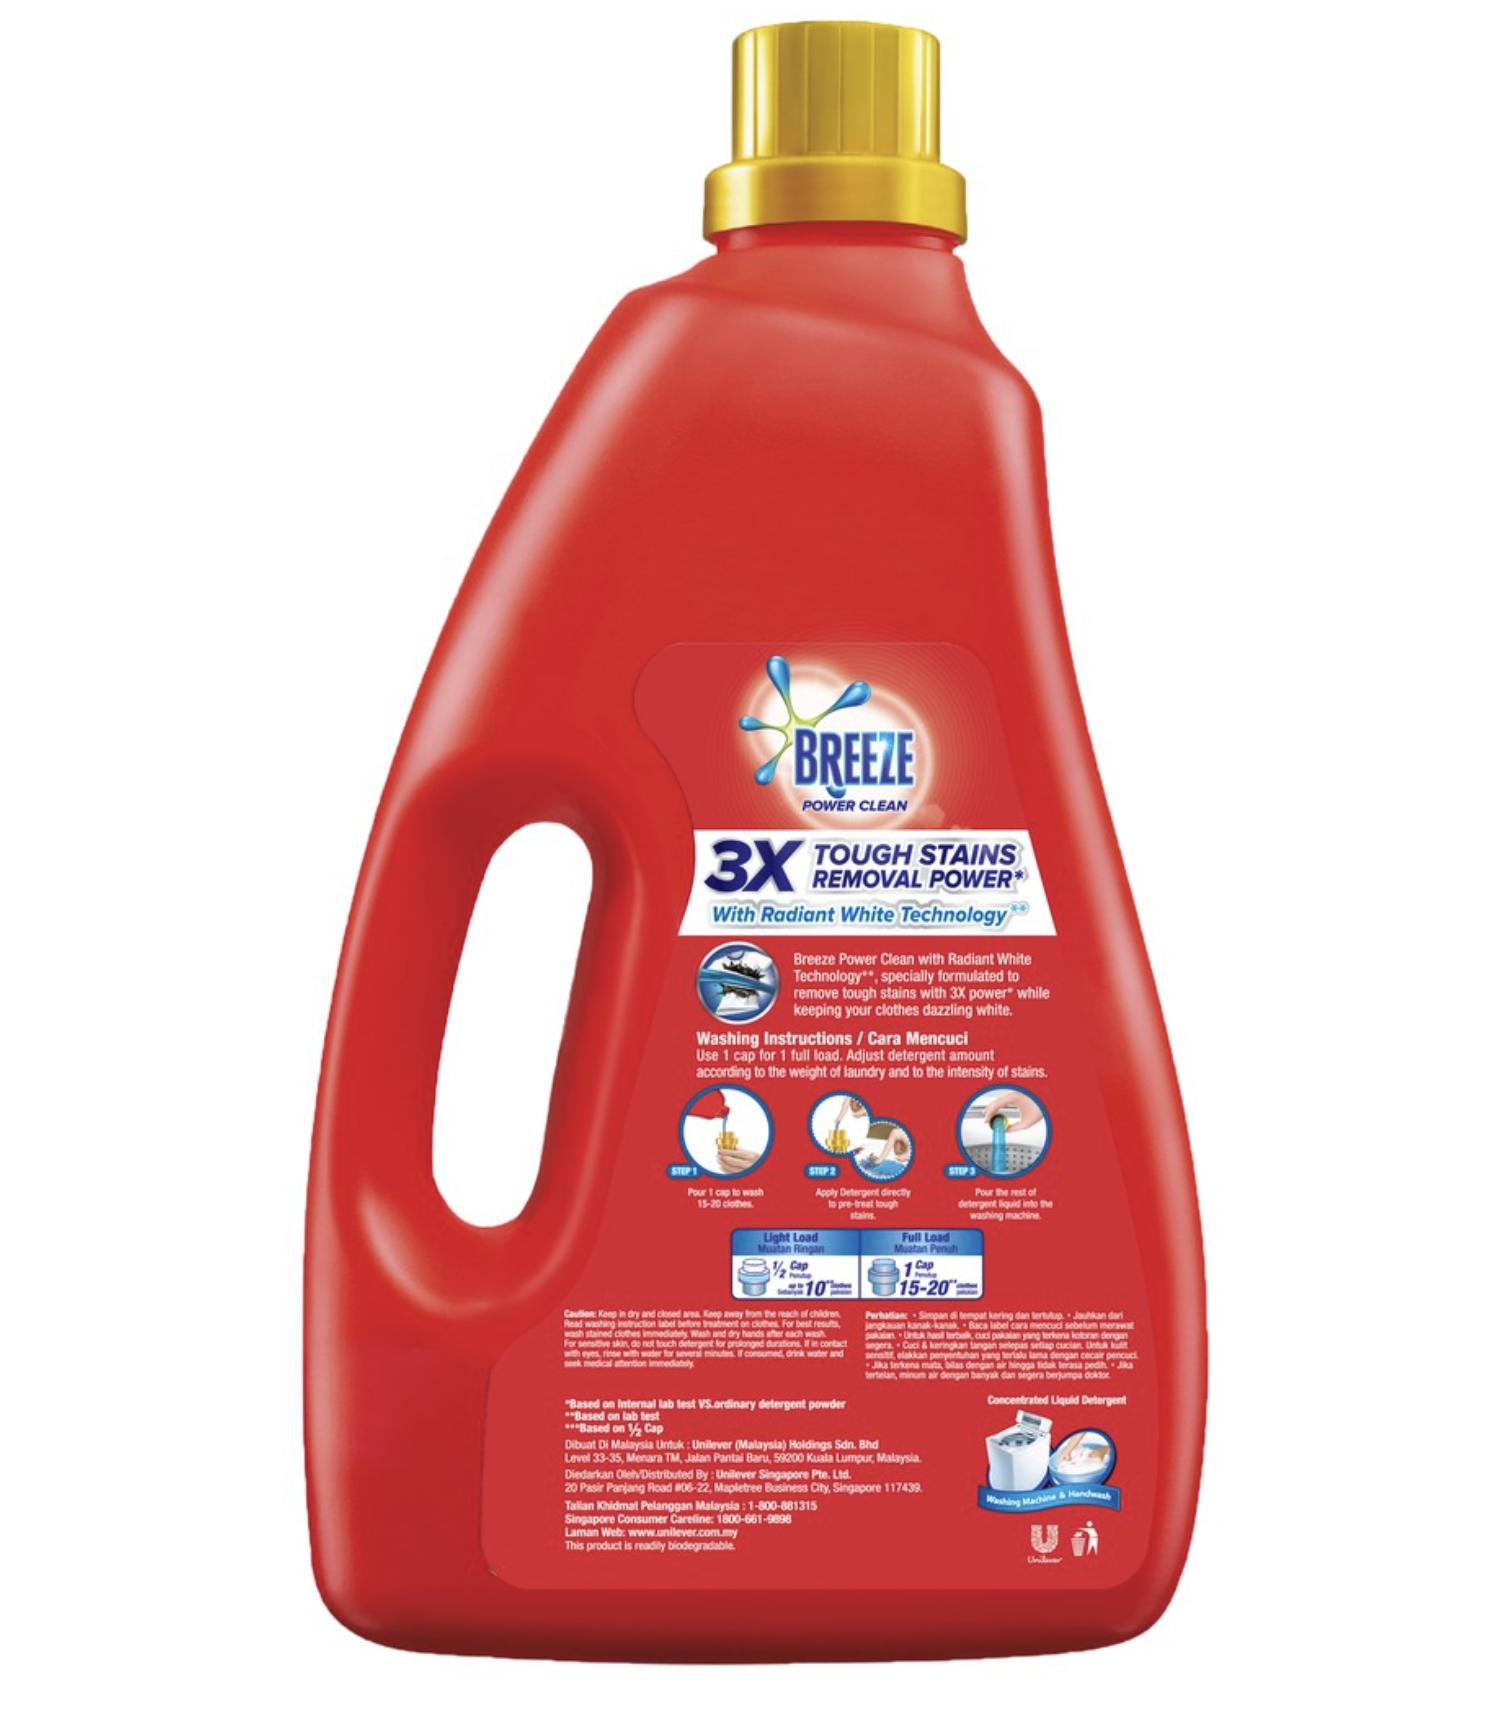 Breeze Power Clean Concentrated Liquid Detergent 3.8kg